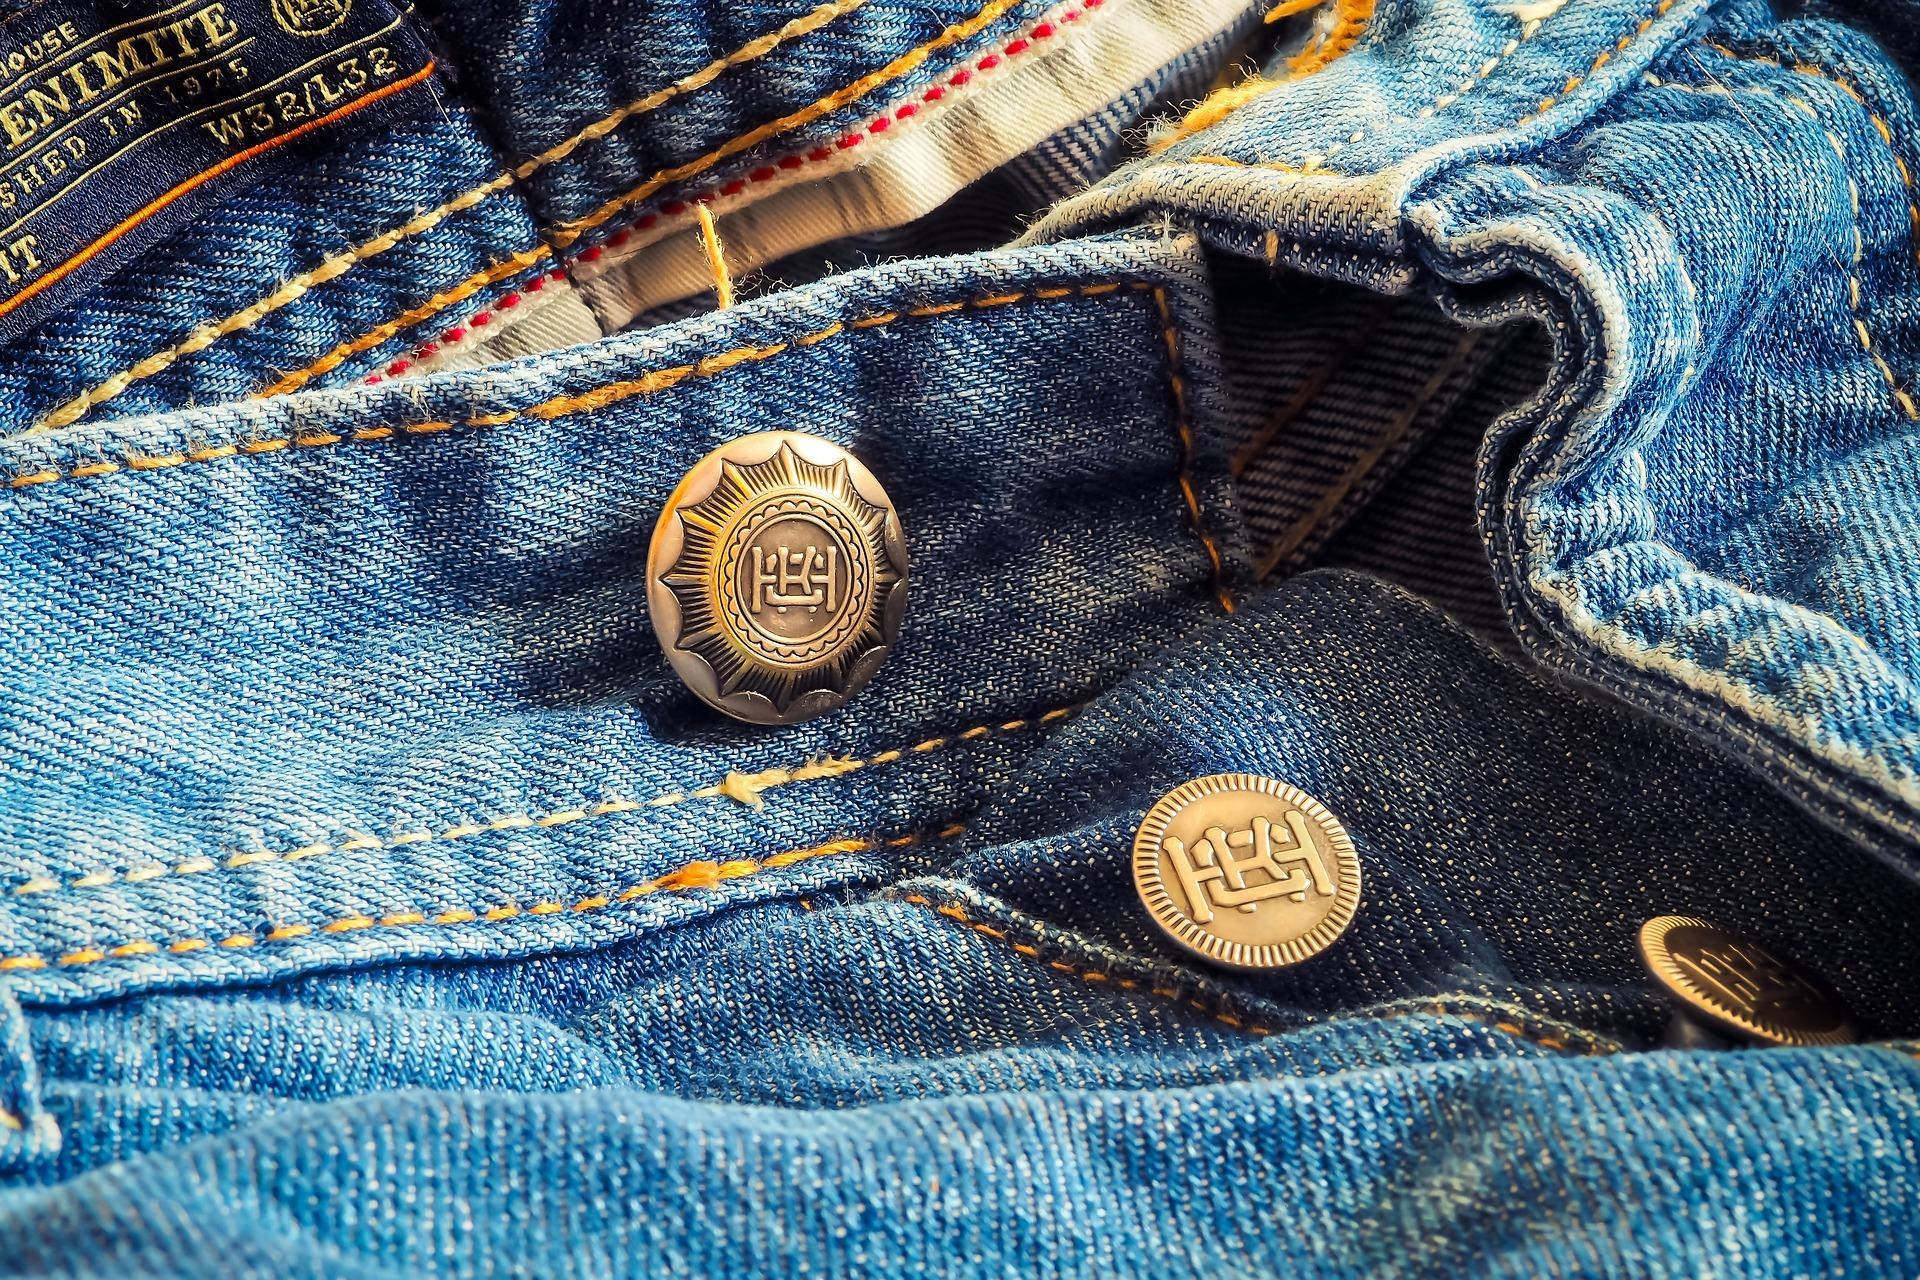 jeans-2979818_1920.jpg